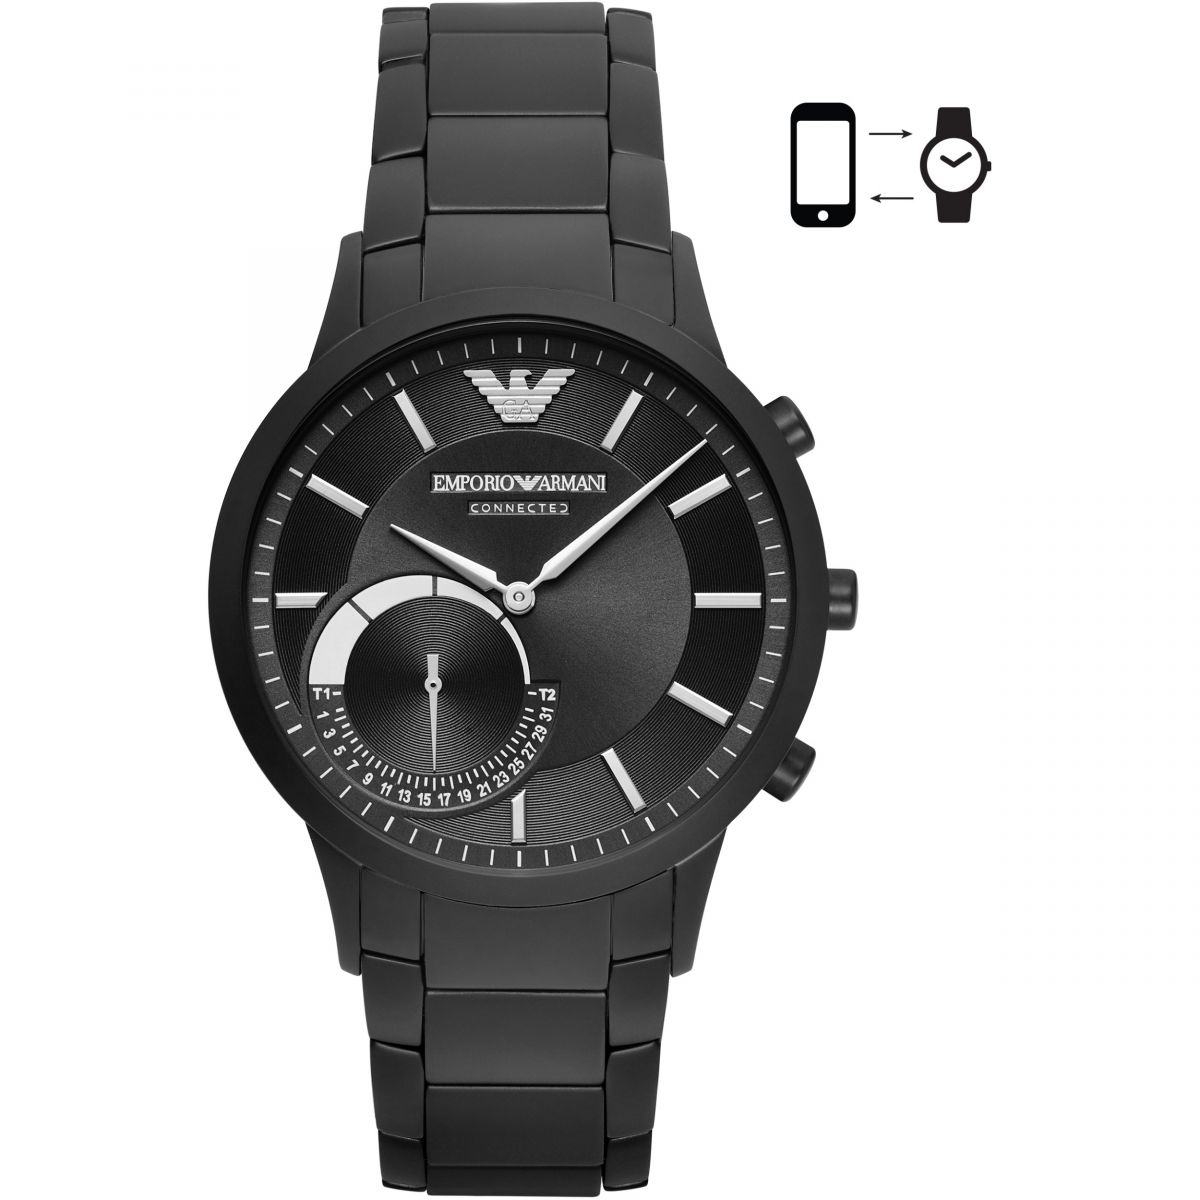 Emporio Armani Connected Watch (ART3001)